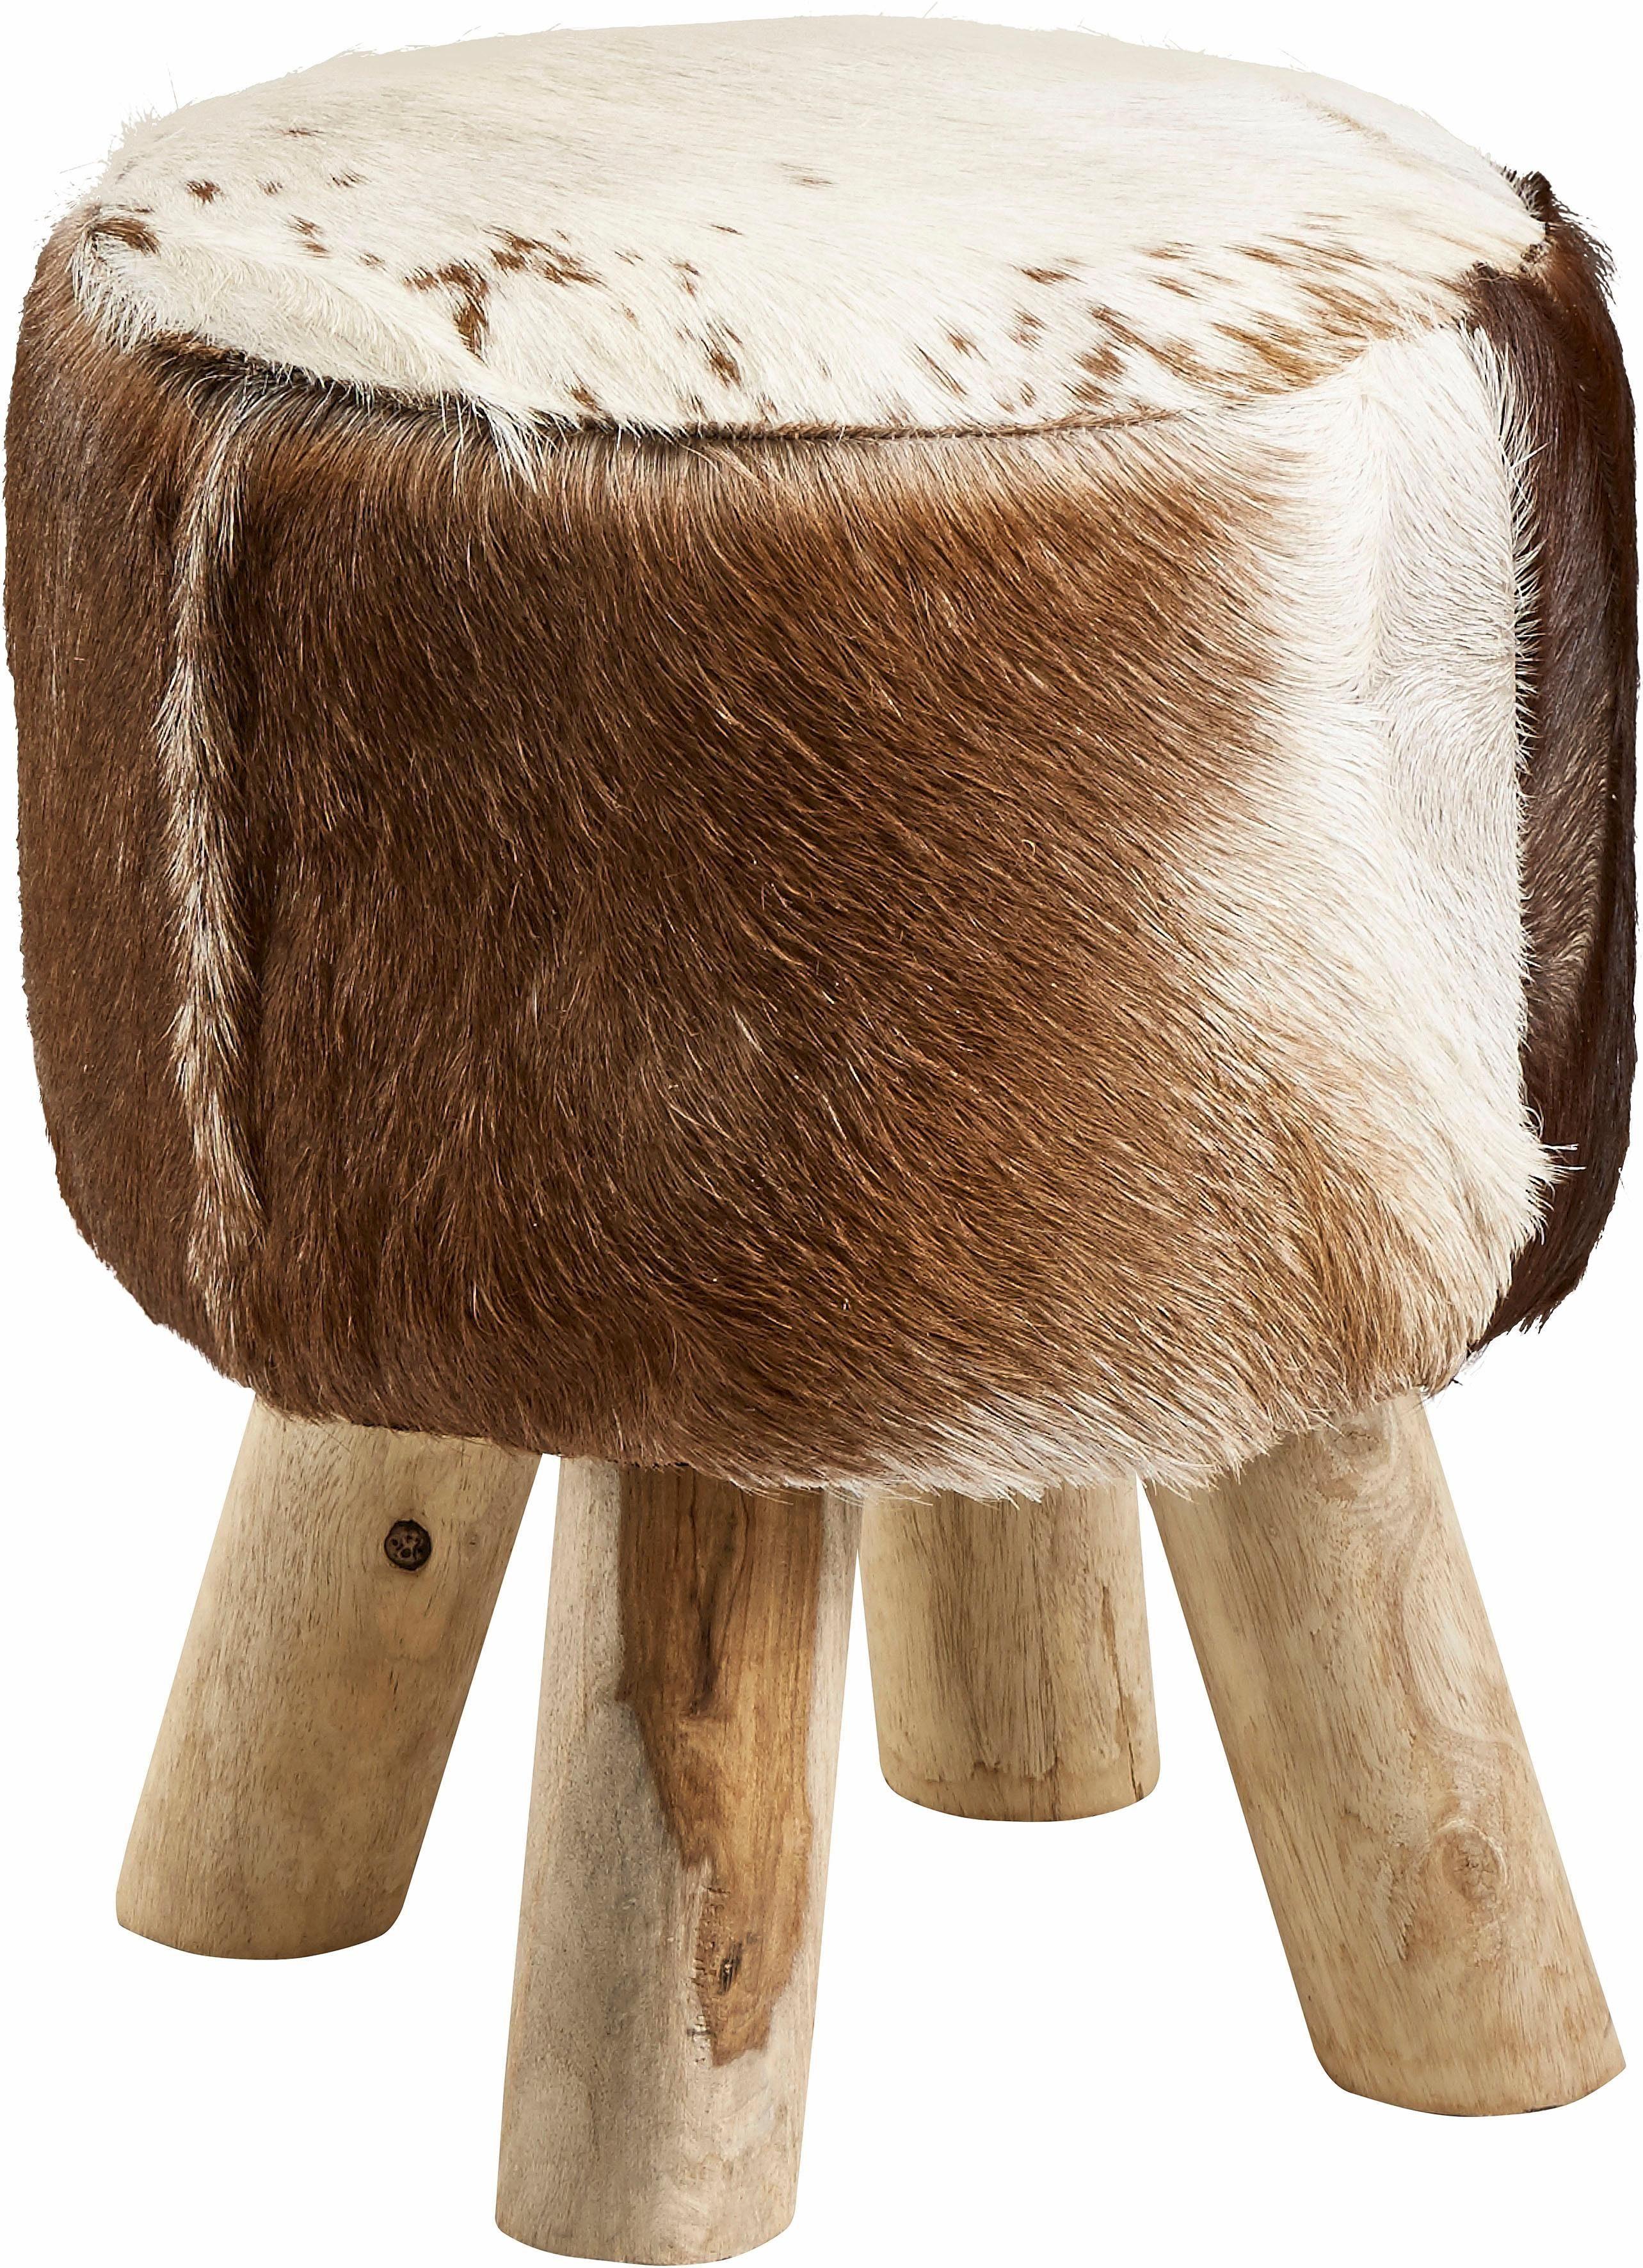 Home affaire Hocker »Kuhfell« mit Holzbeinen